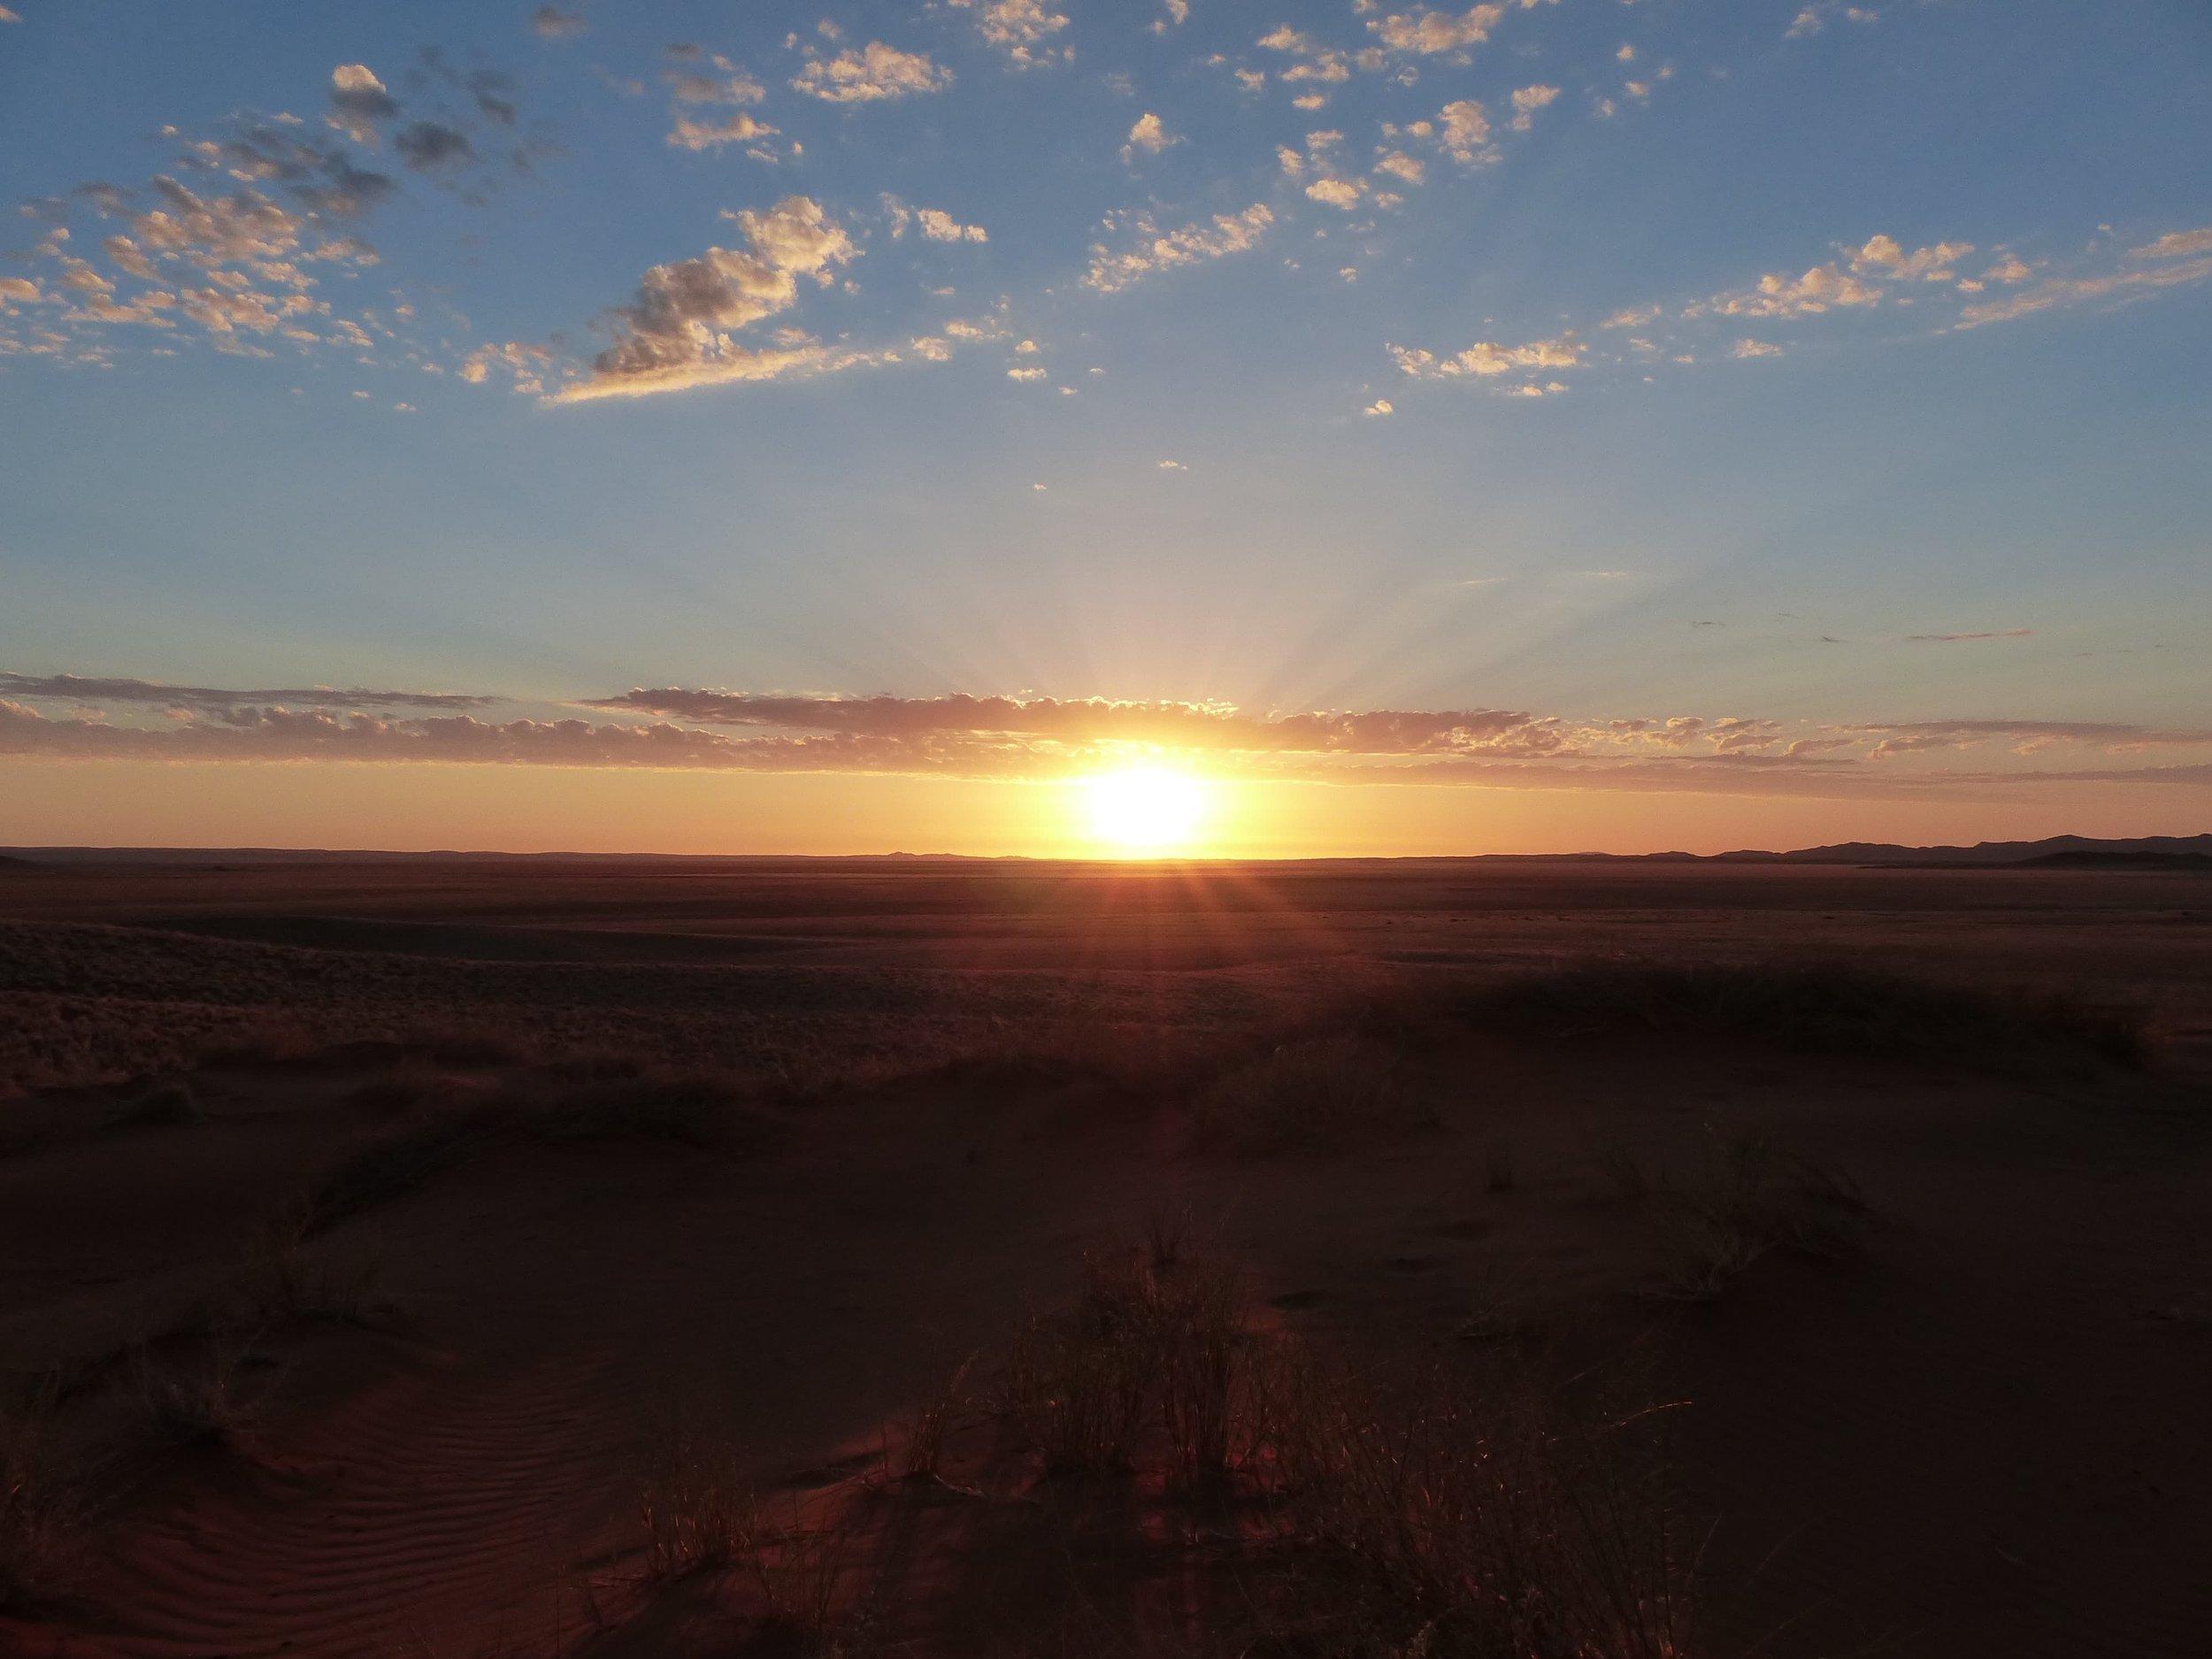 sunset-2011396-min.jpg